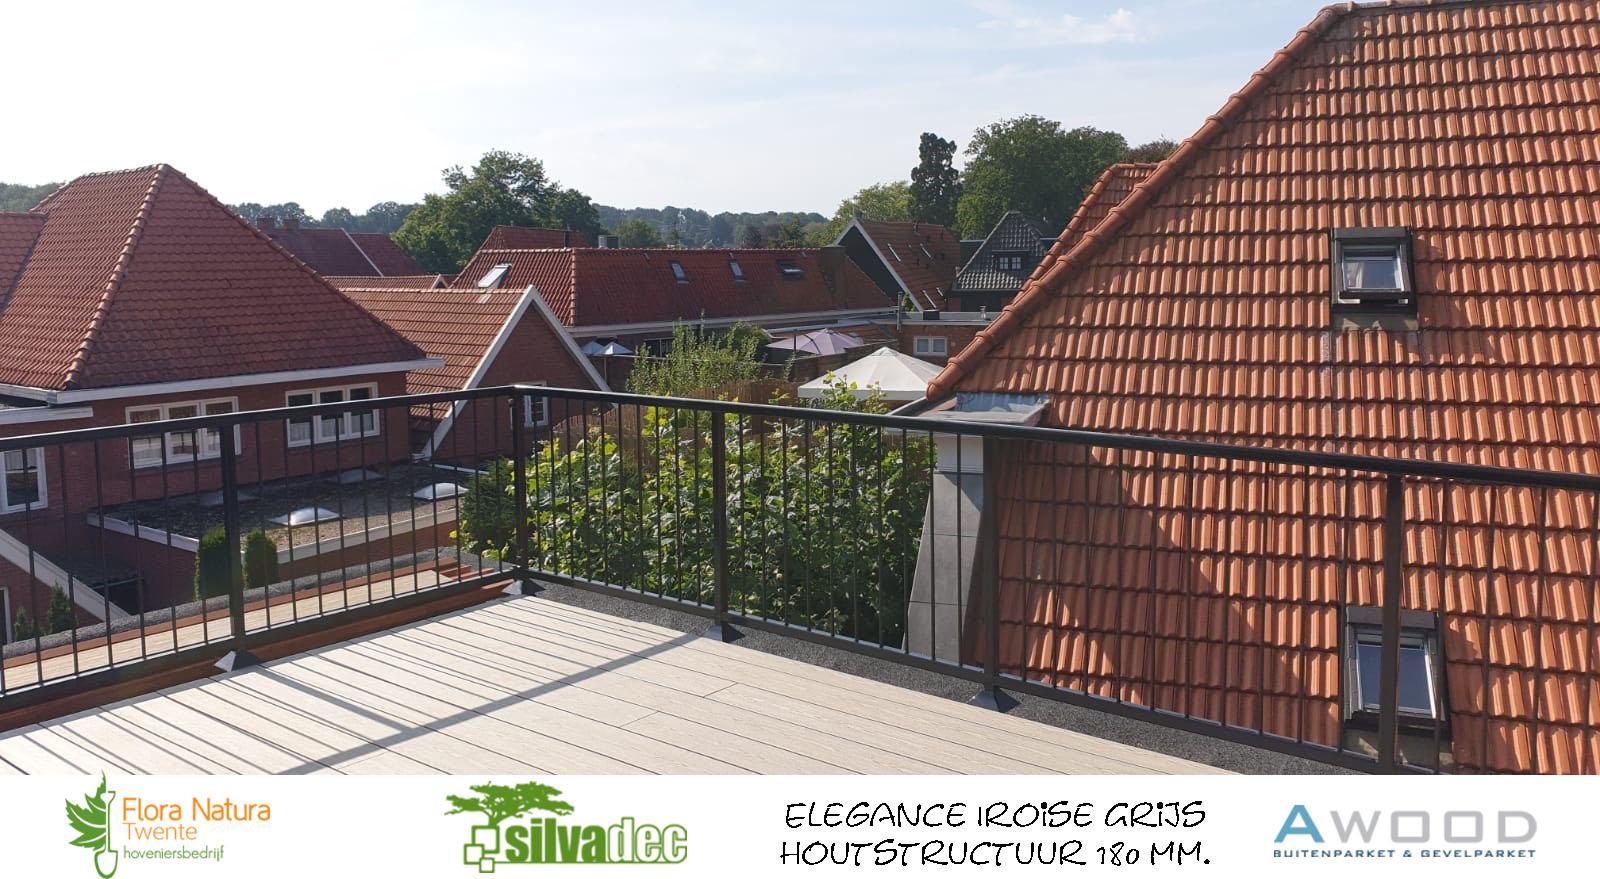 Silvadec Elegance Iorise houtstructuur Ootmarsum Flora natura Twente 2 logo